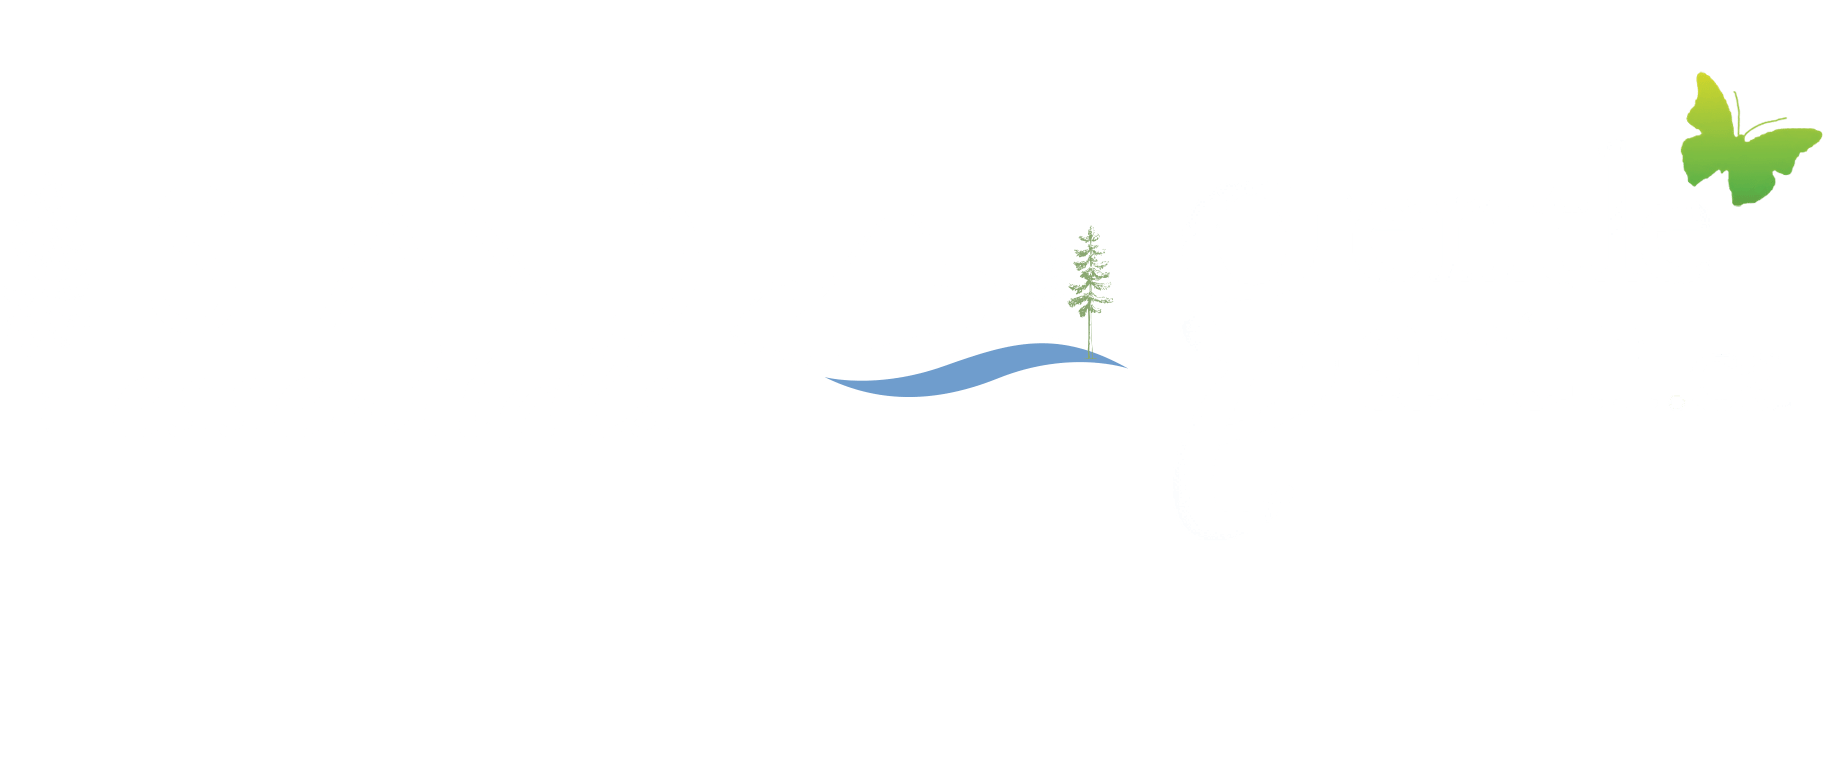 Gentle Earth & Island Essentials